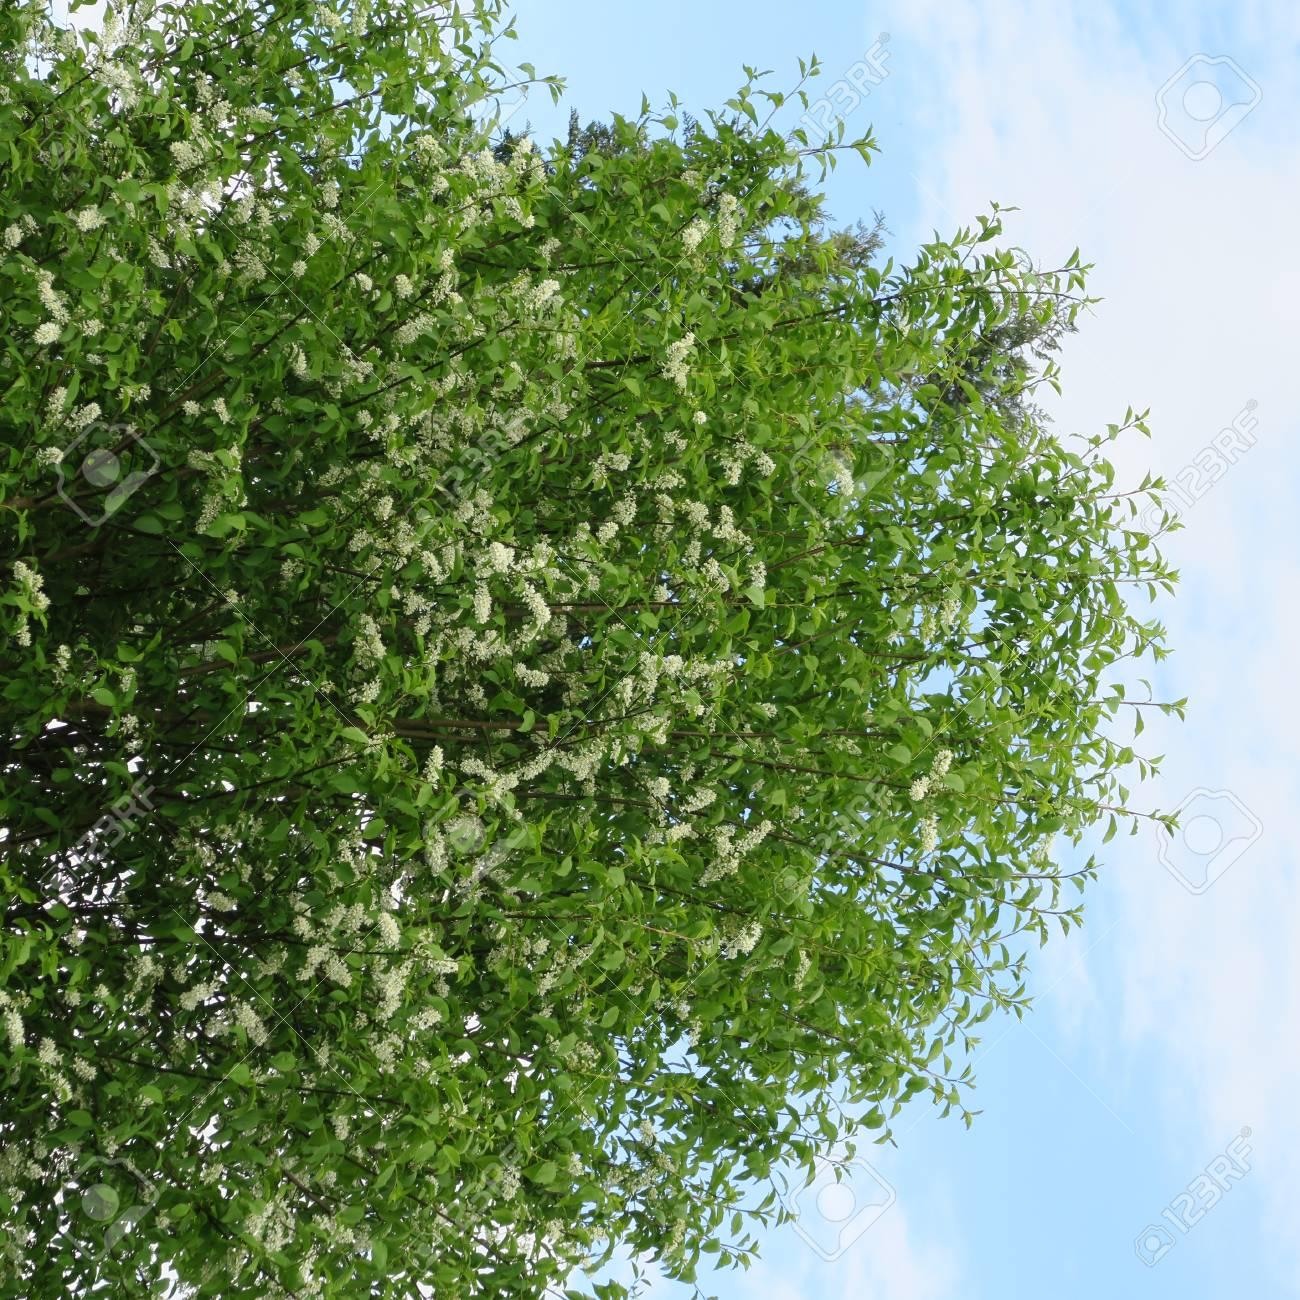 Prunus Paduswhite Flowering Tree To The Smells Of Honey In Spring